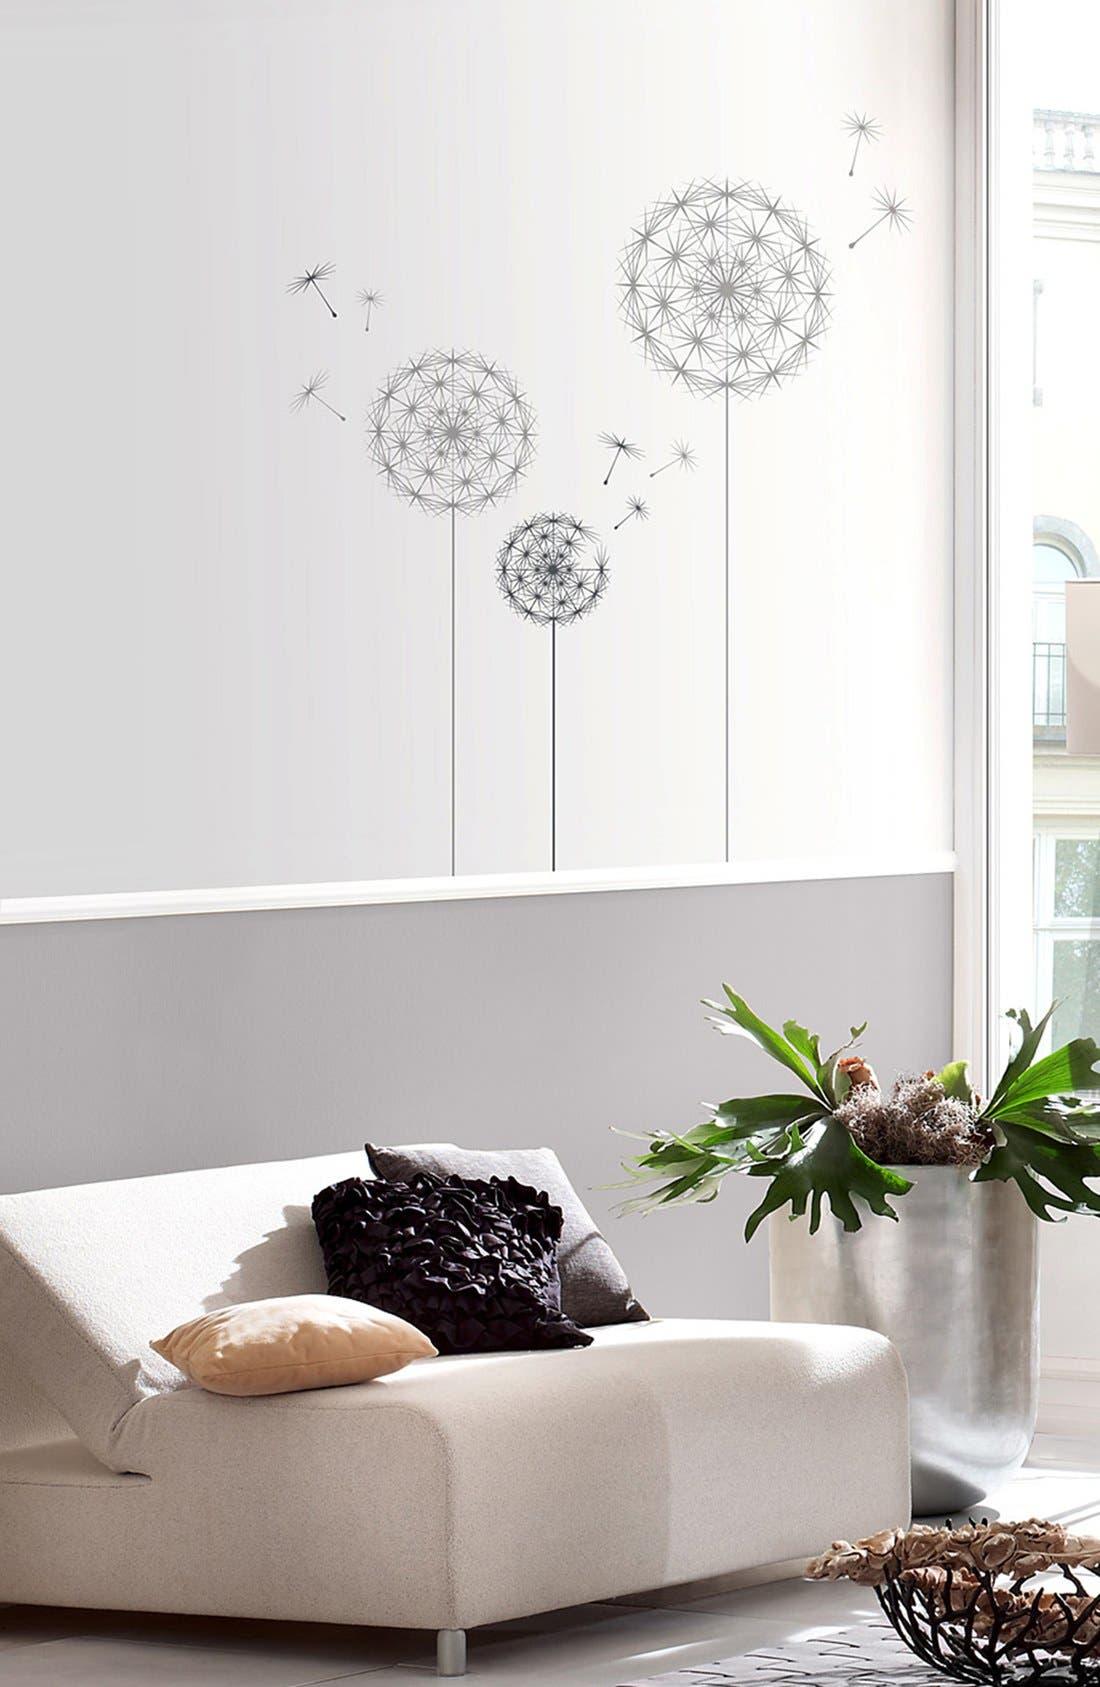 Main Image - Wallpops 'Dandelion' Wall Art